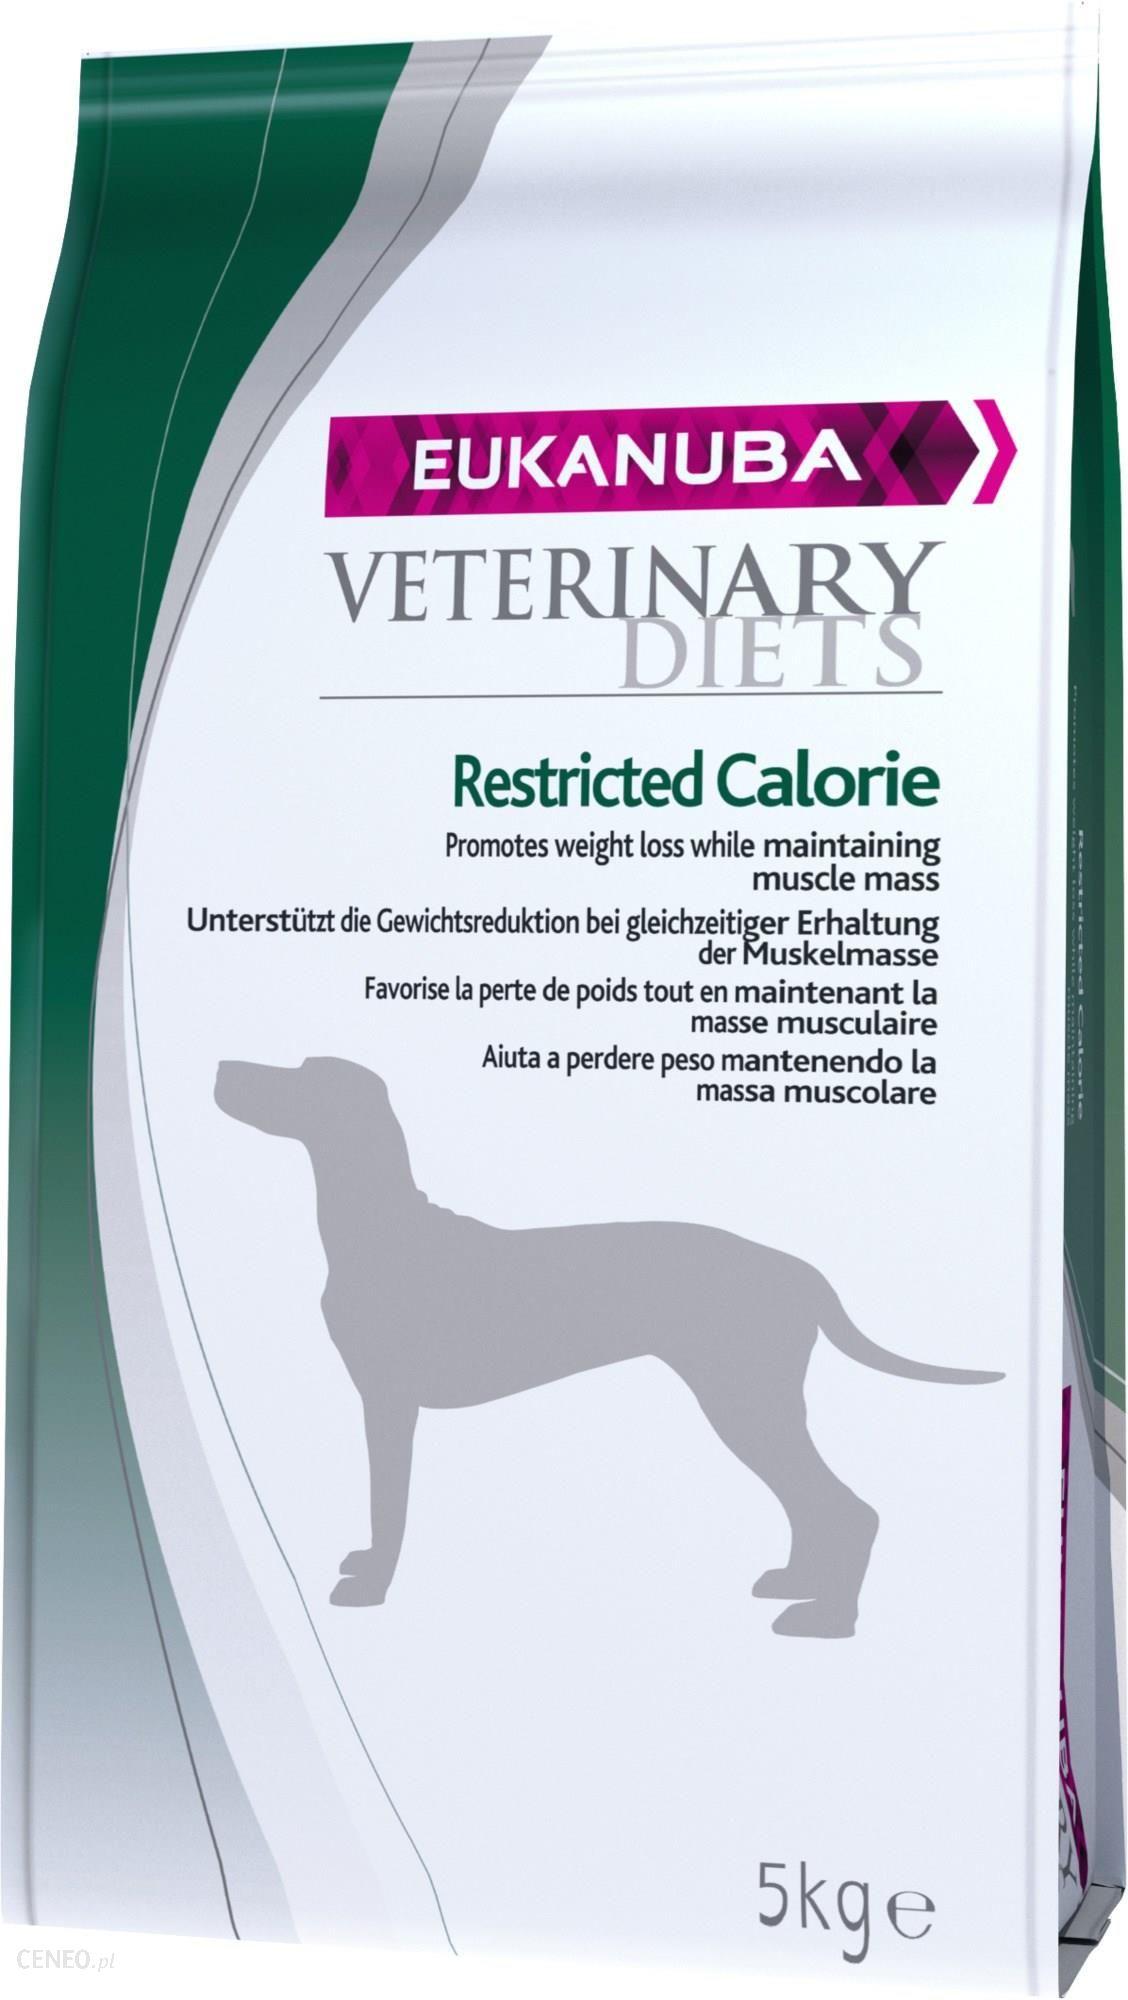 Eukanuba Veterinary Diets Adult Restricted Calorie 5kg